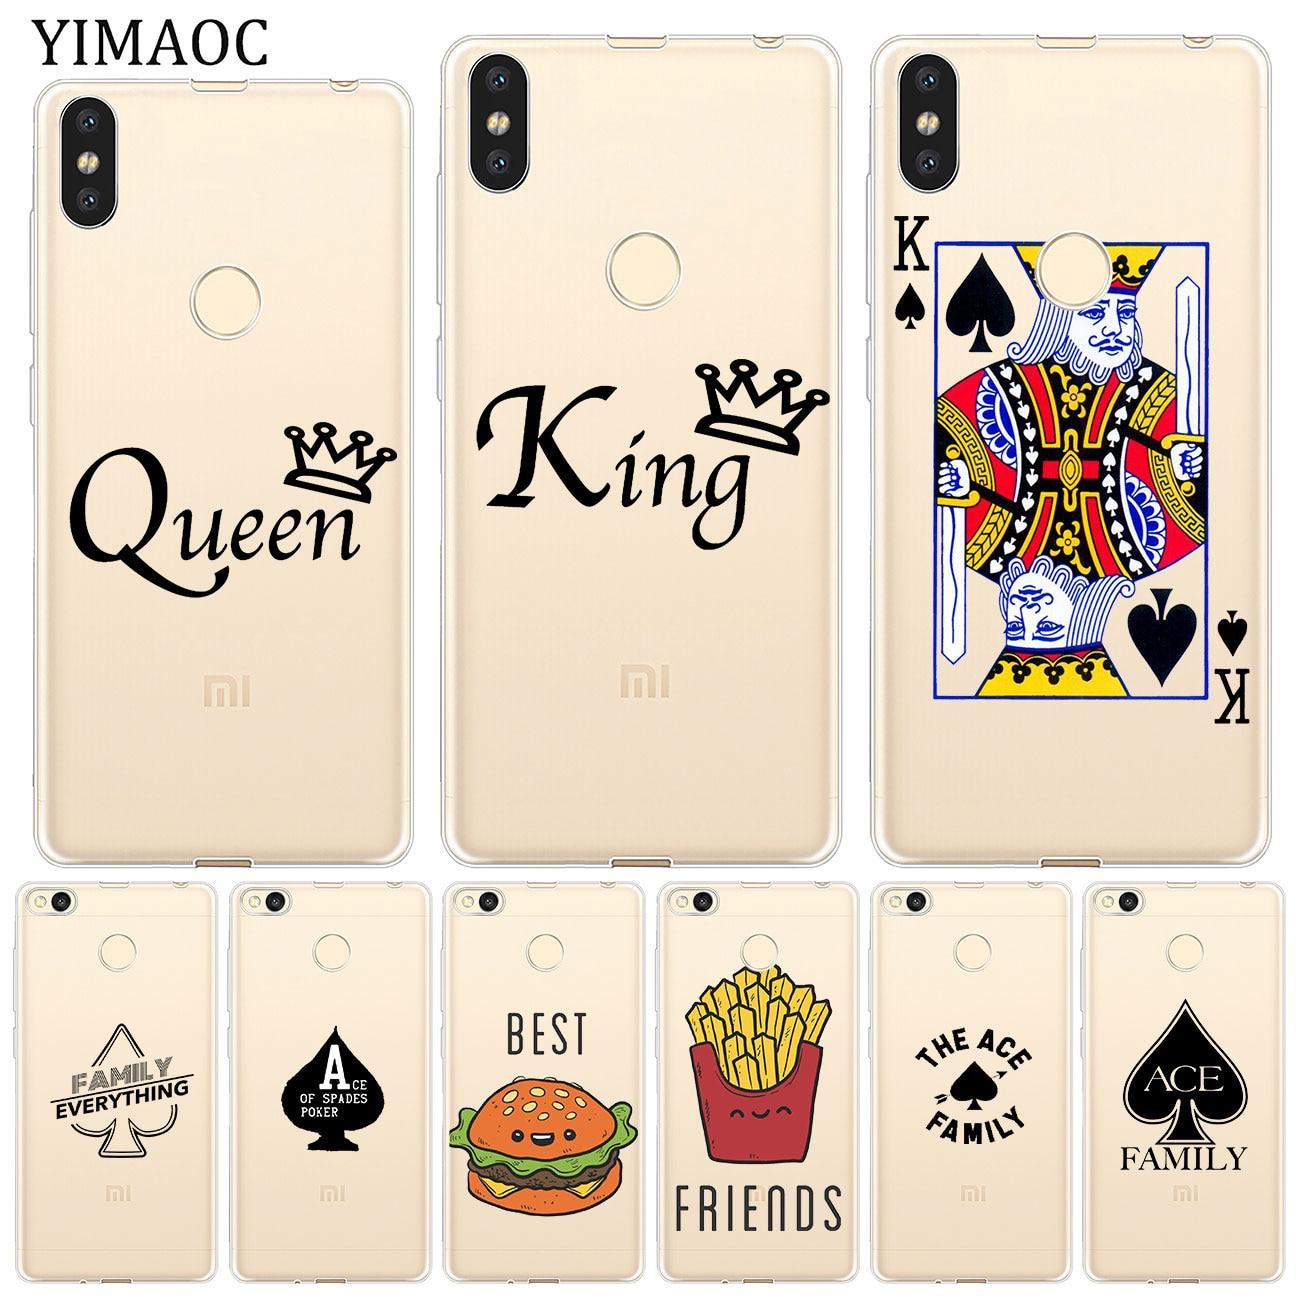 YIMAOC ace family poker Best Friends Soft Case for Xiaomi Mi 9 9T CC9 CC9E A3 Pro 8 SE A2 Lite A1 Mi